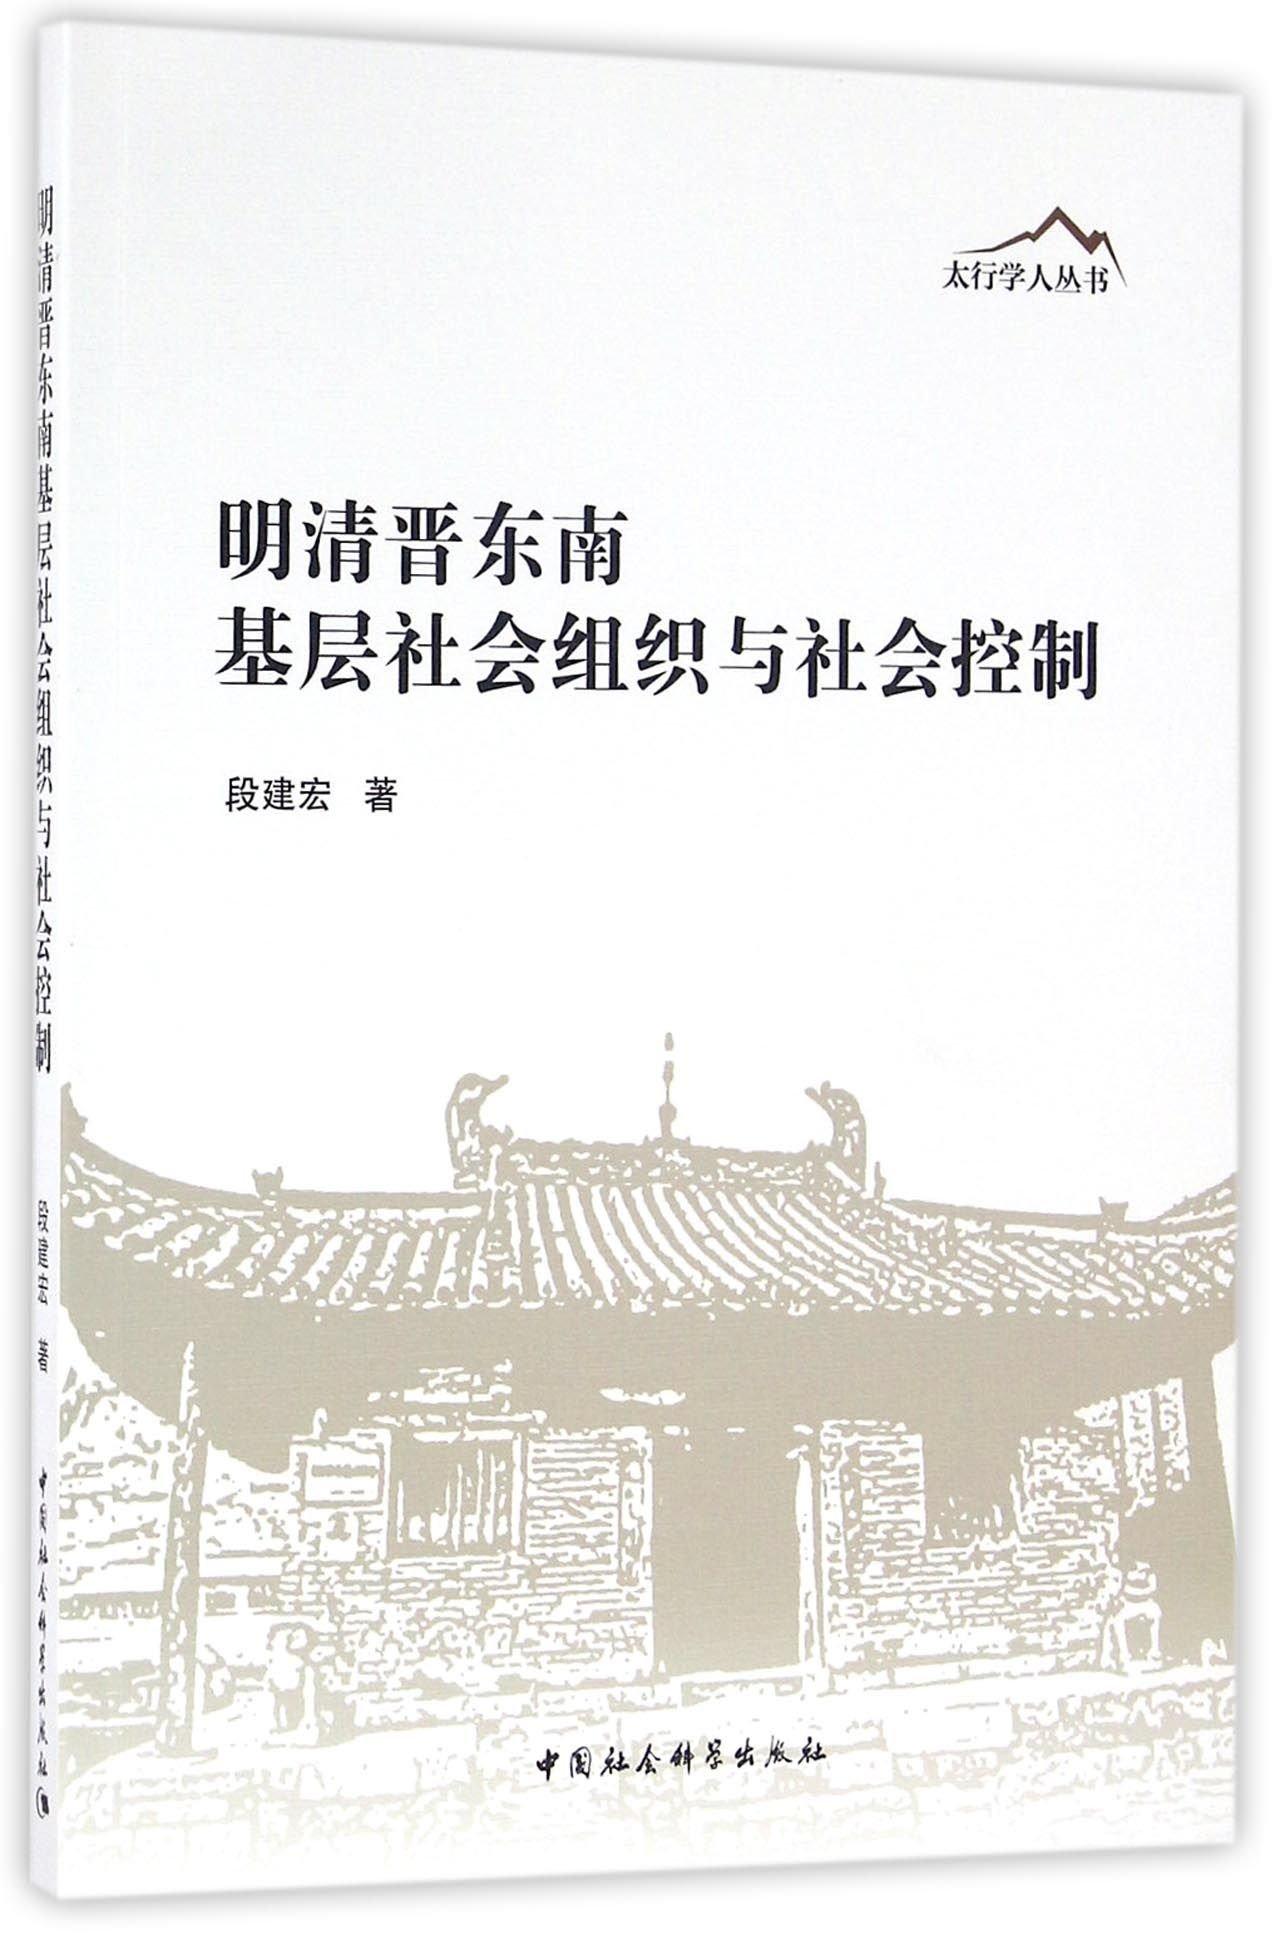 Download 明清晋东南基层社会组织与社会控制/太行学人丛书 pdf